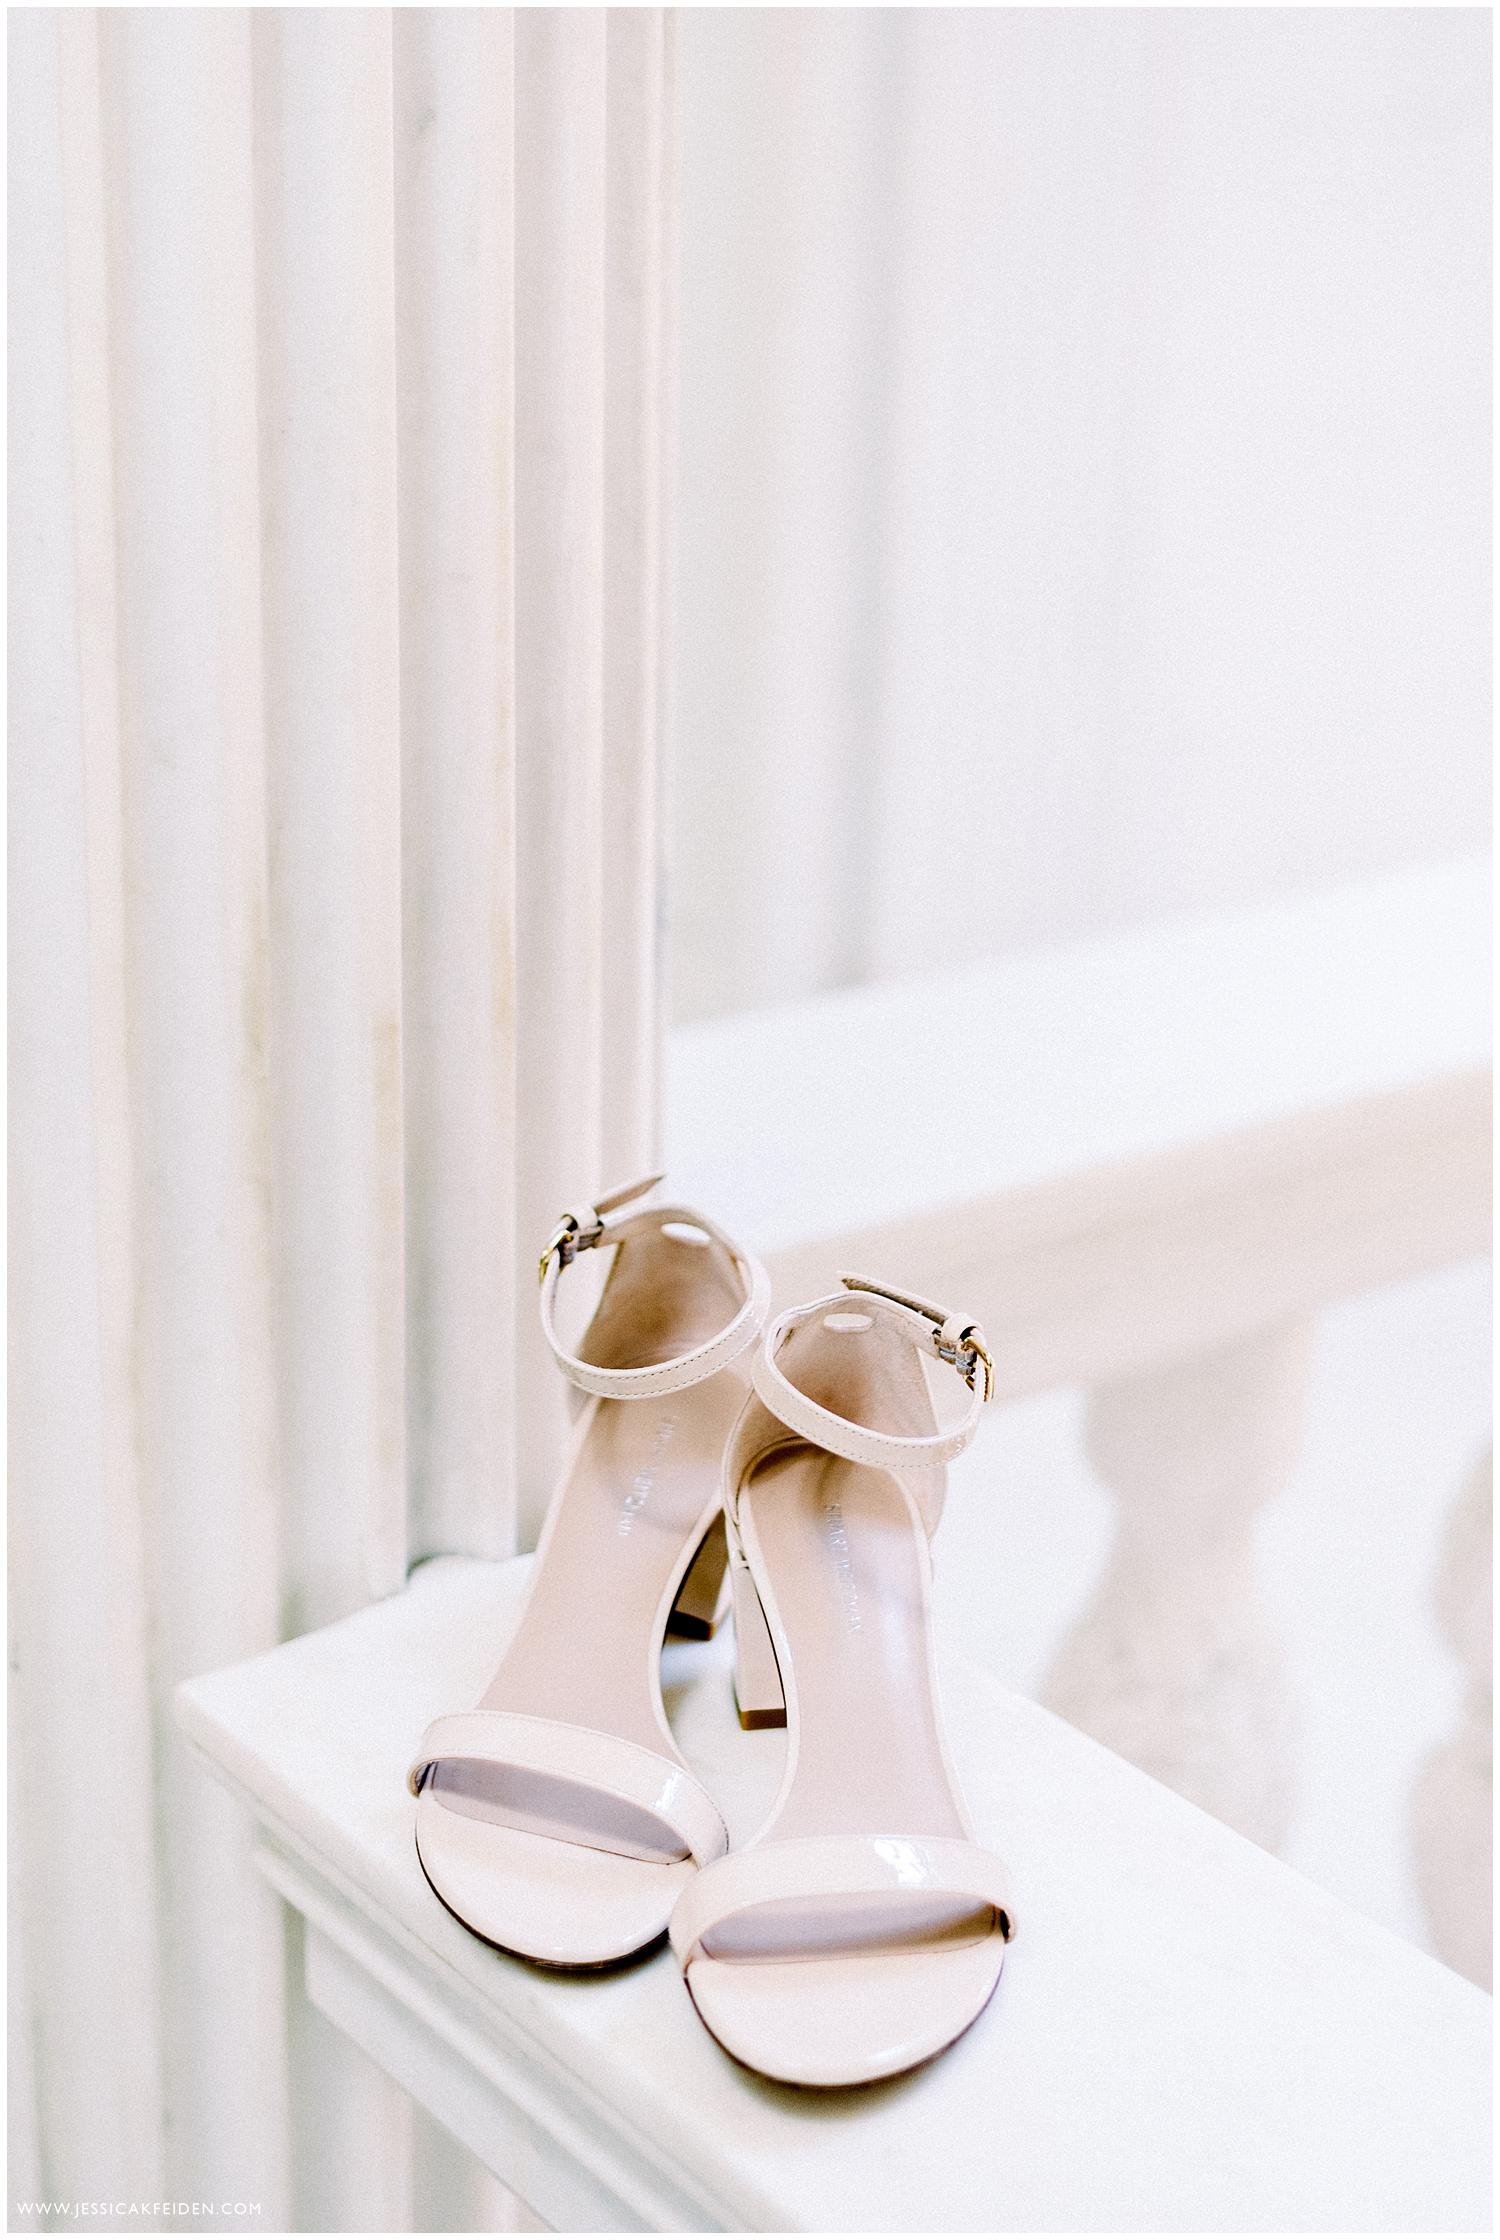 Jessica K Feiden Photography_NYIT de Seversky Mansion Long Island Wedding_0005.jpg